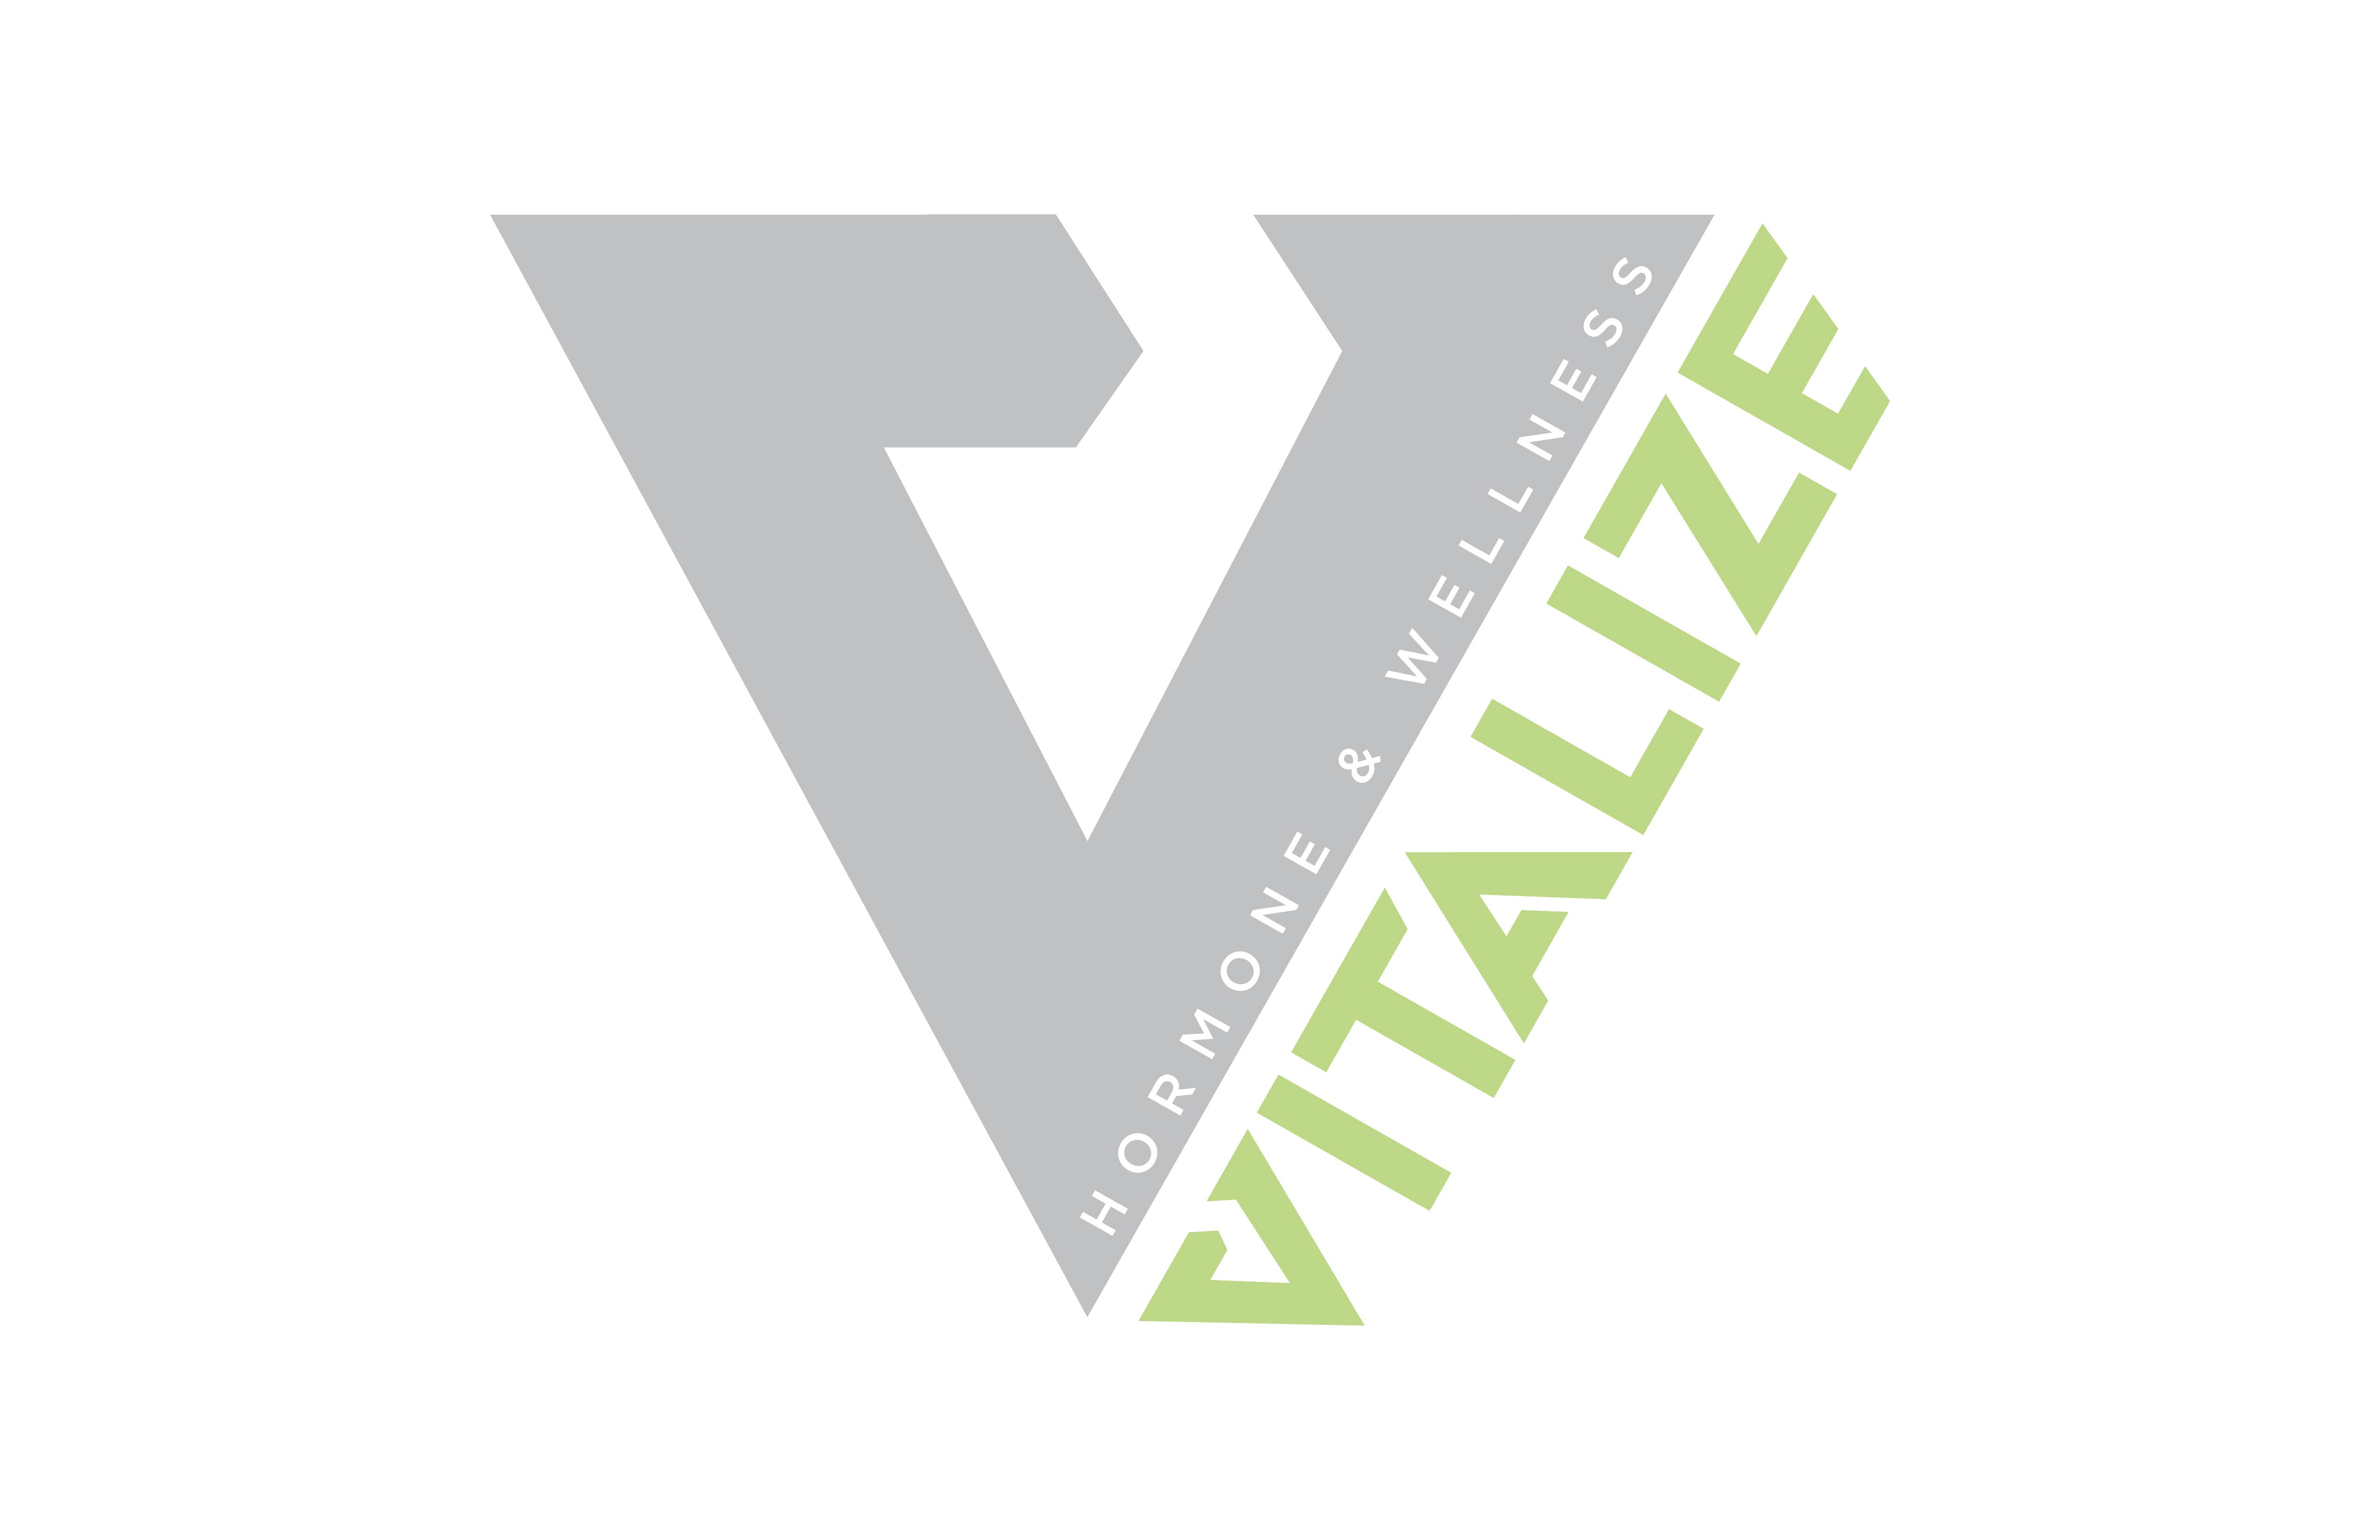 Vitalize_V LOGO_May2021